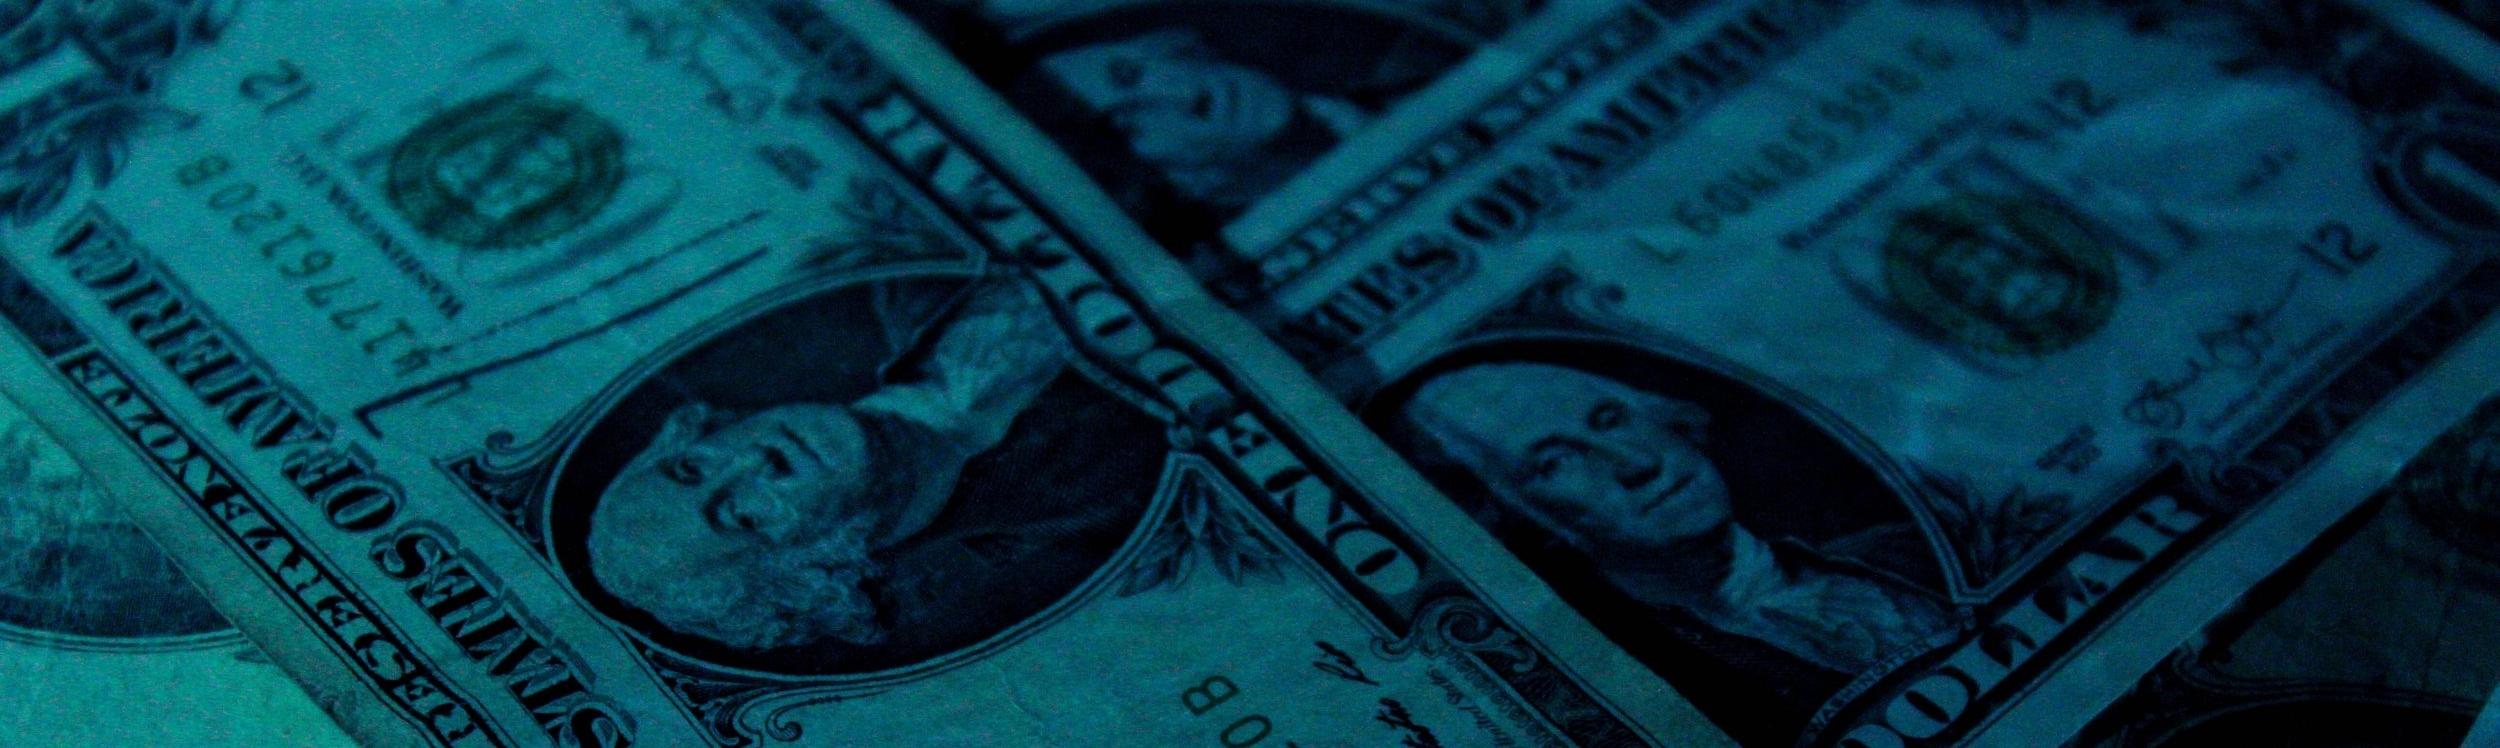 Photograph; dollar bills lying on a flat surface.